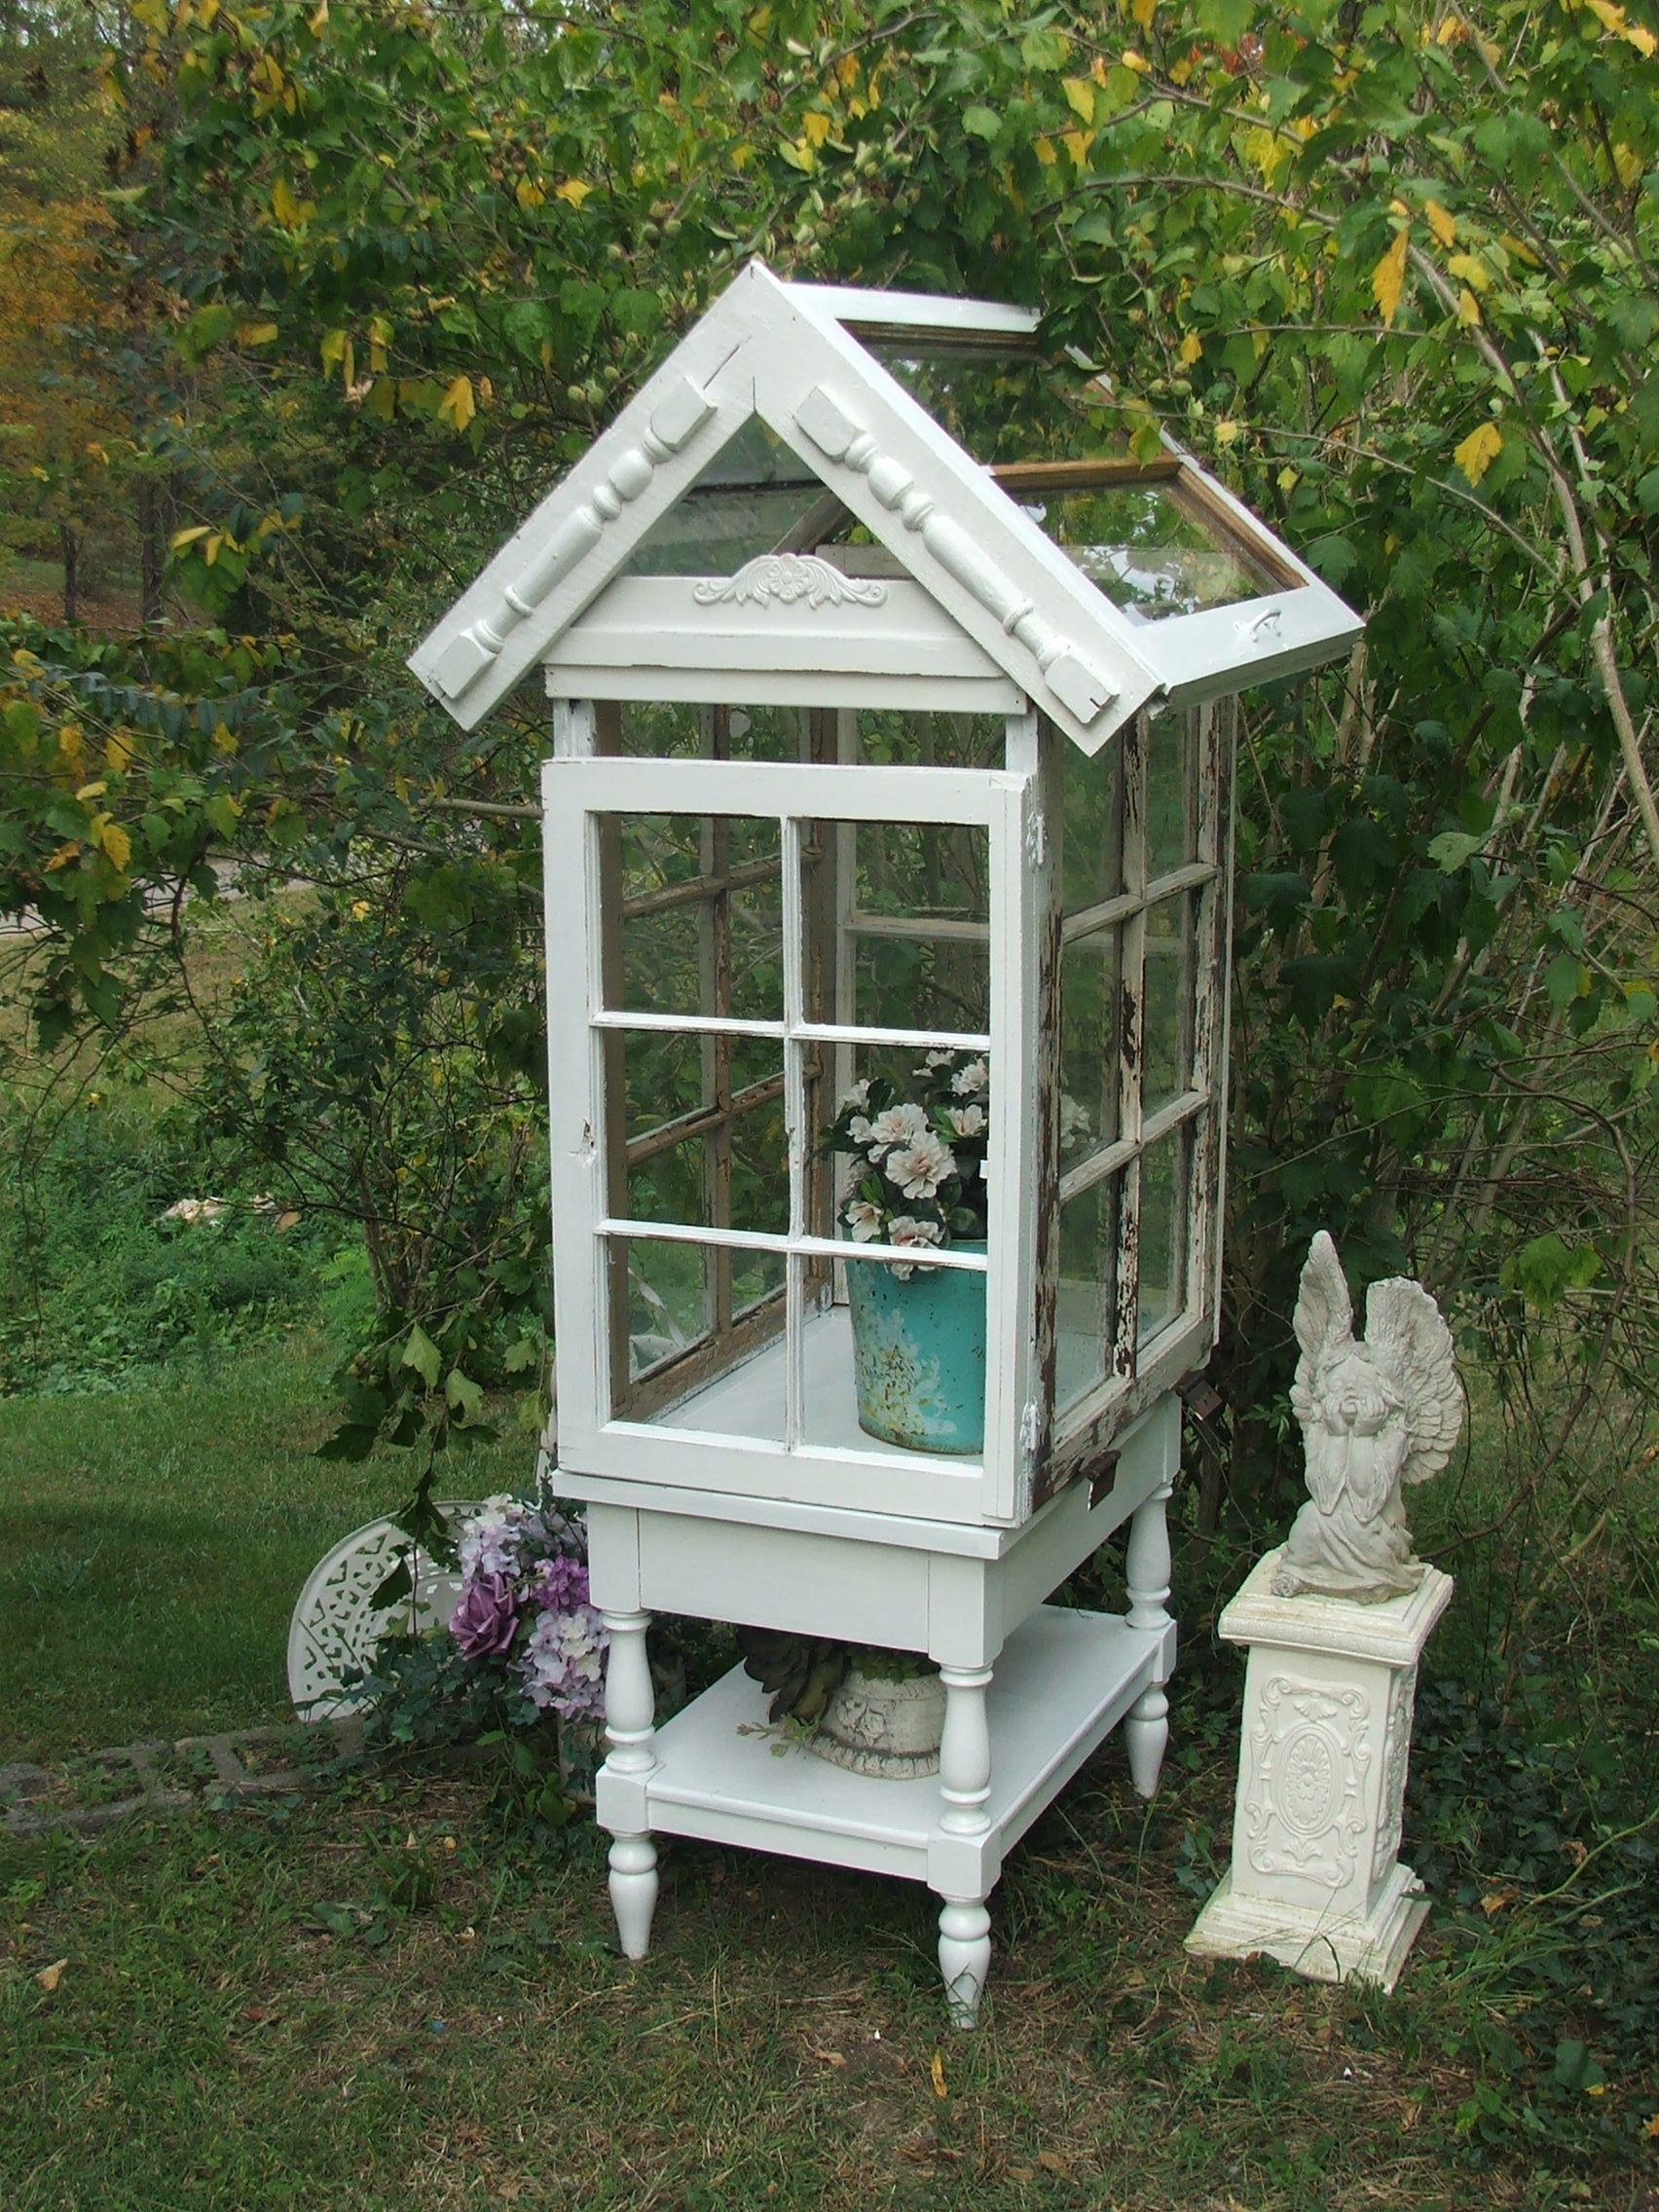 Shabby Gartendeko Schön Mini Greenhouse Cool We Have Lots Of Old Windows Frames